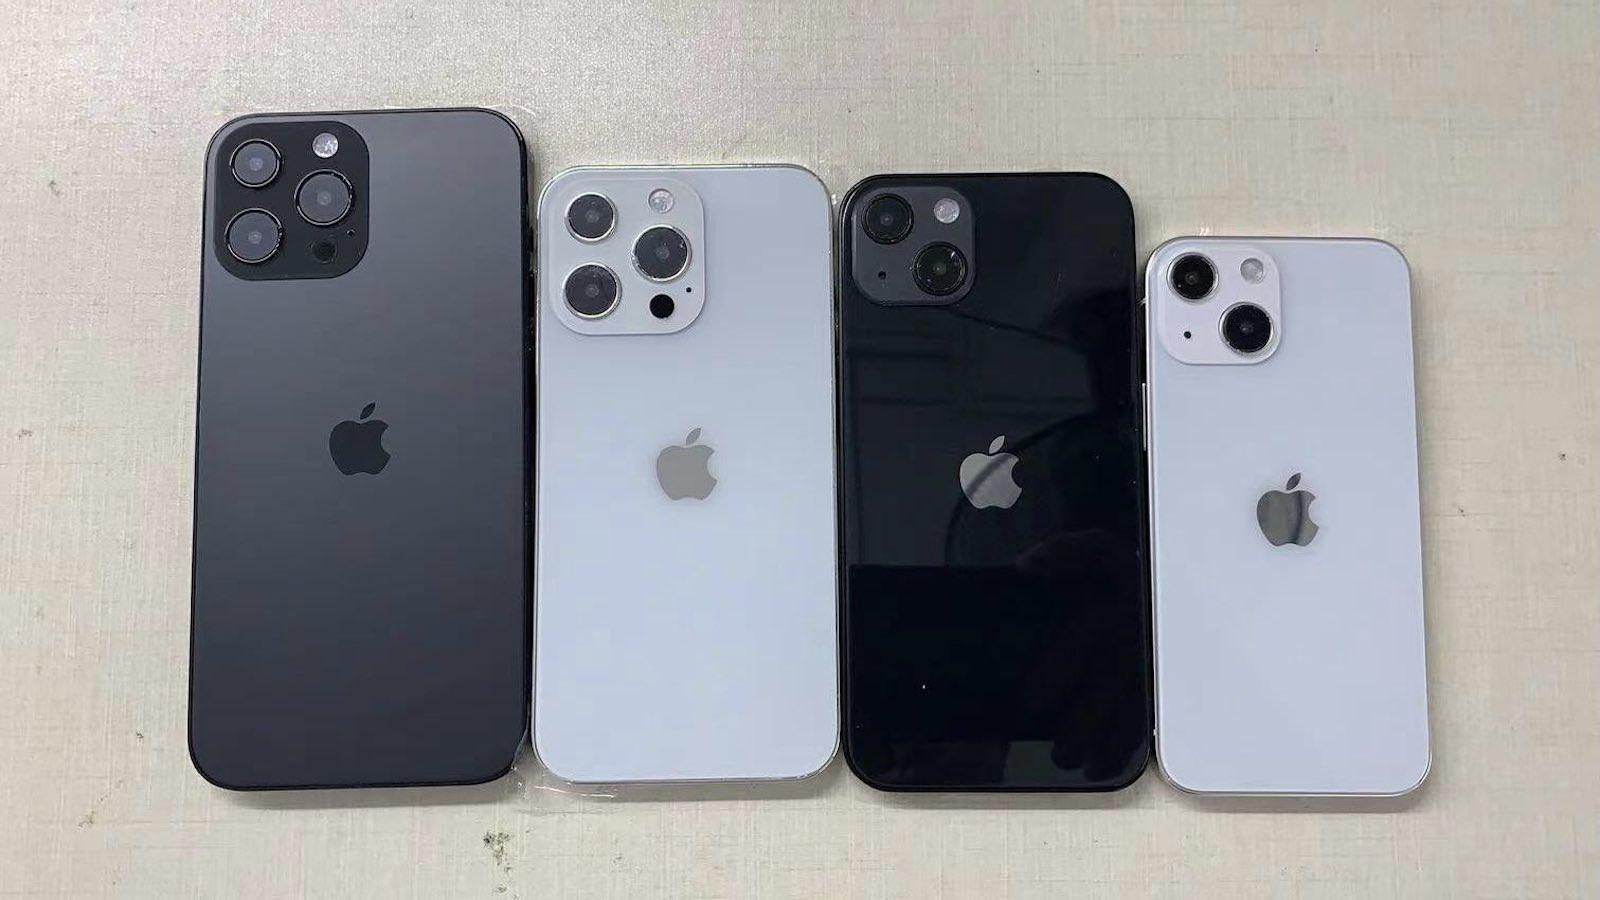 Iphone 13 series dummy models